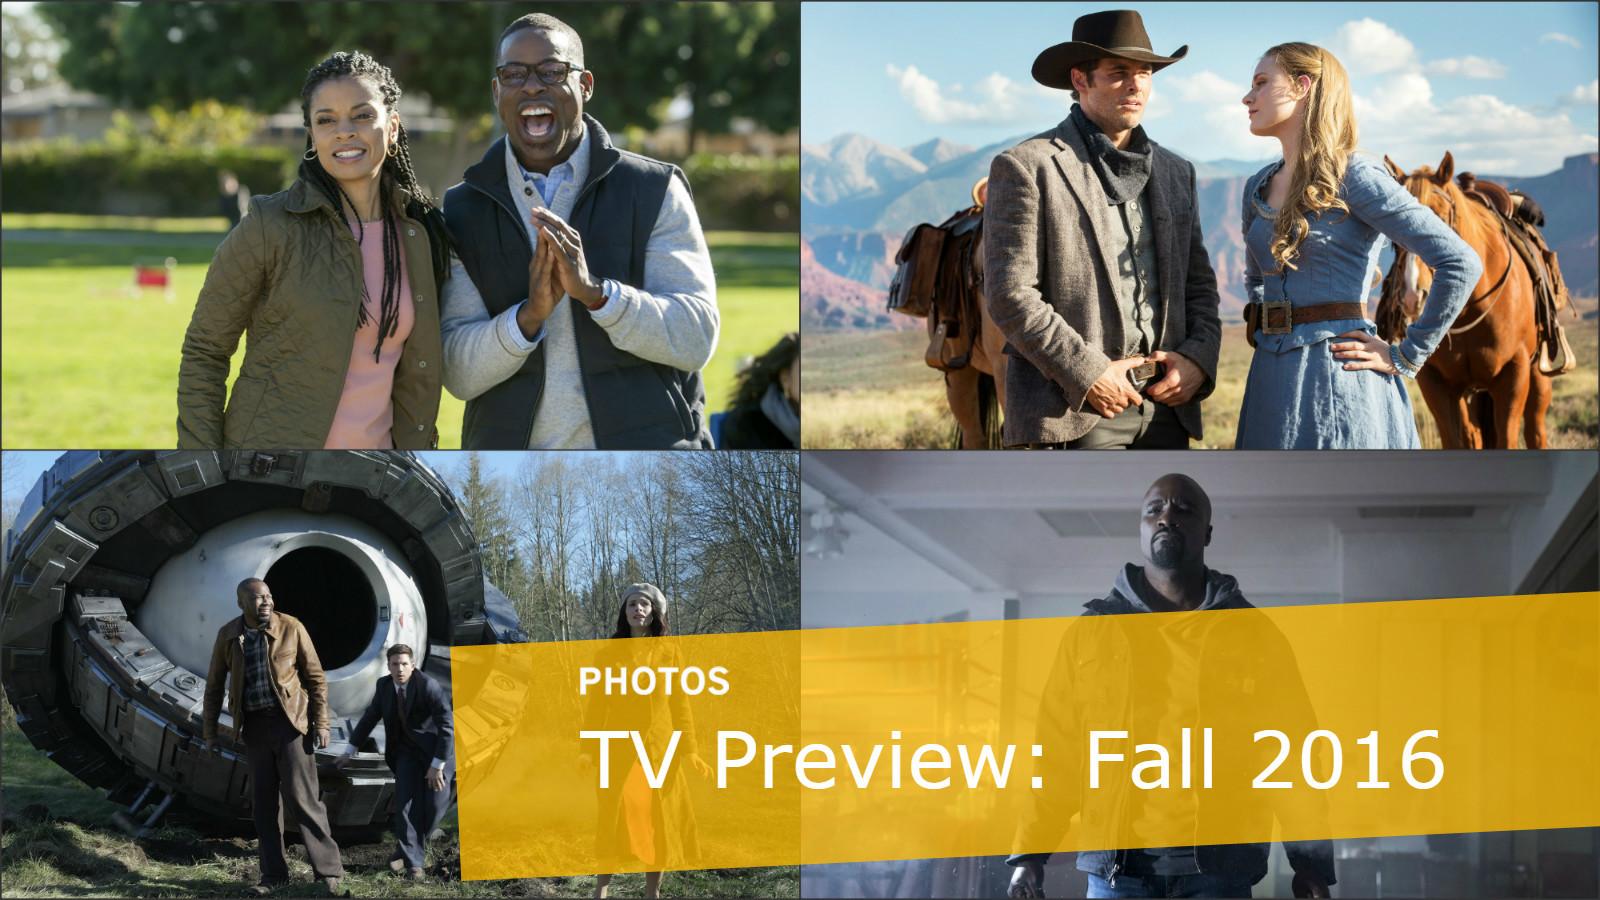 TV Preview: Fall 2016 - LA Times